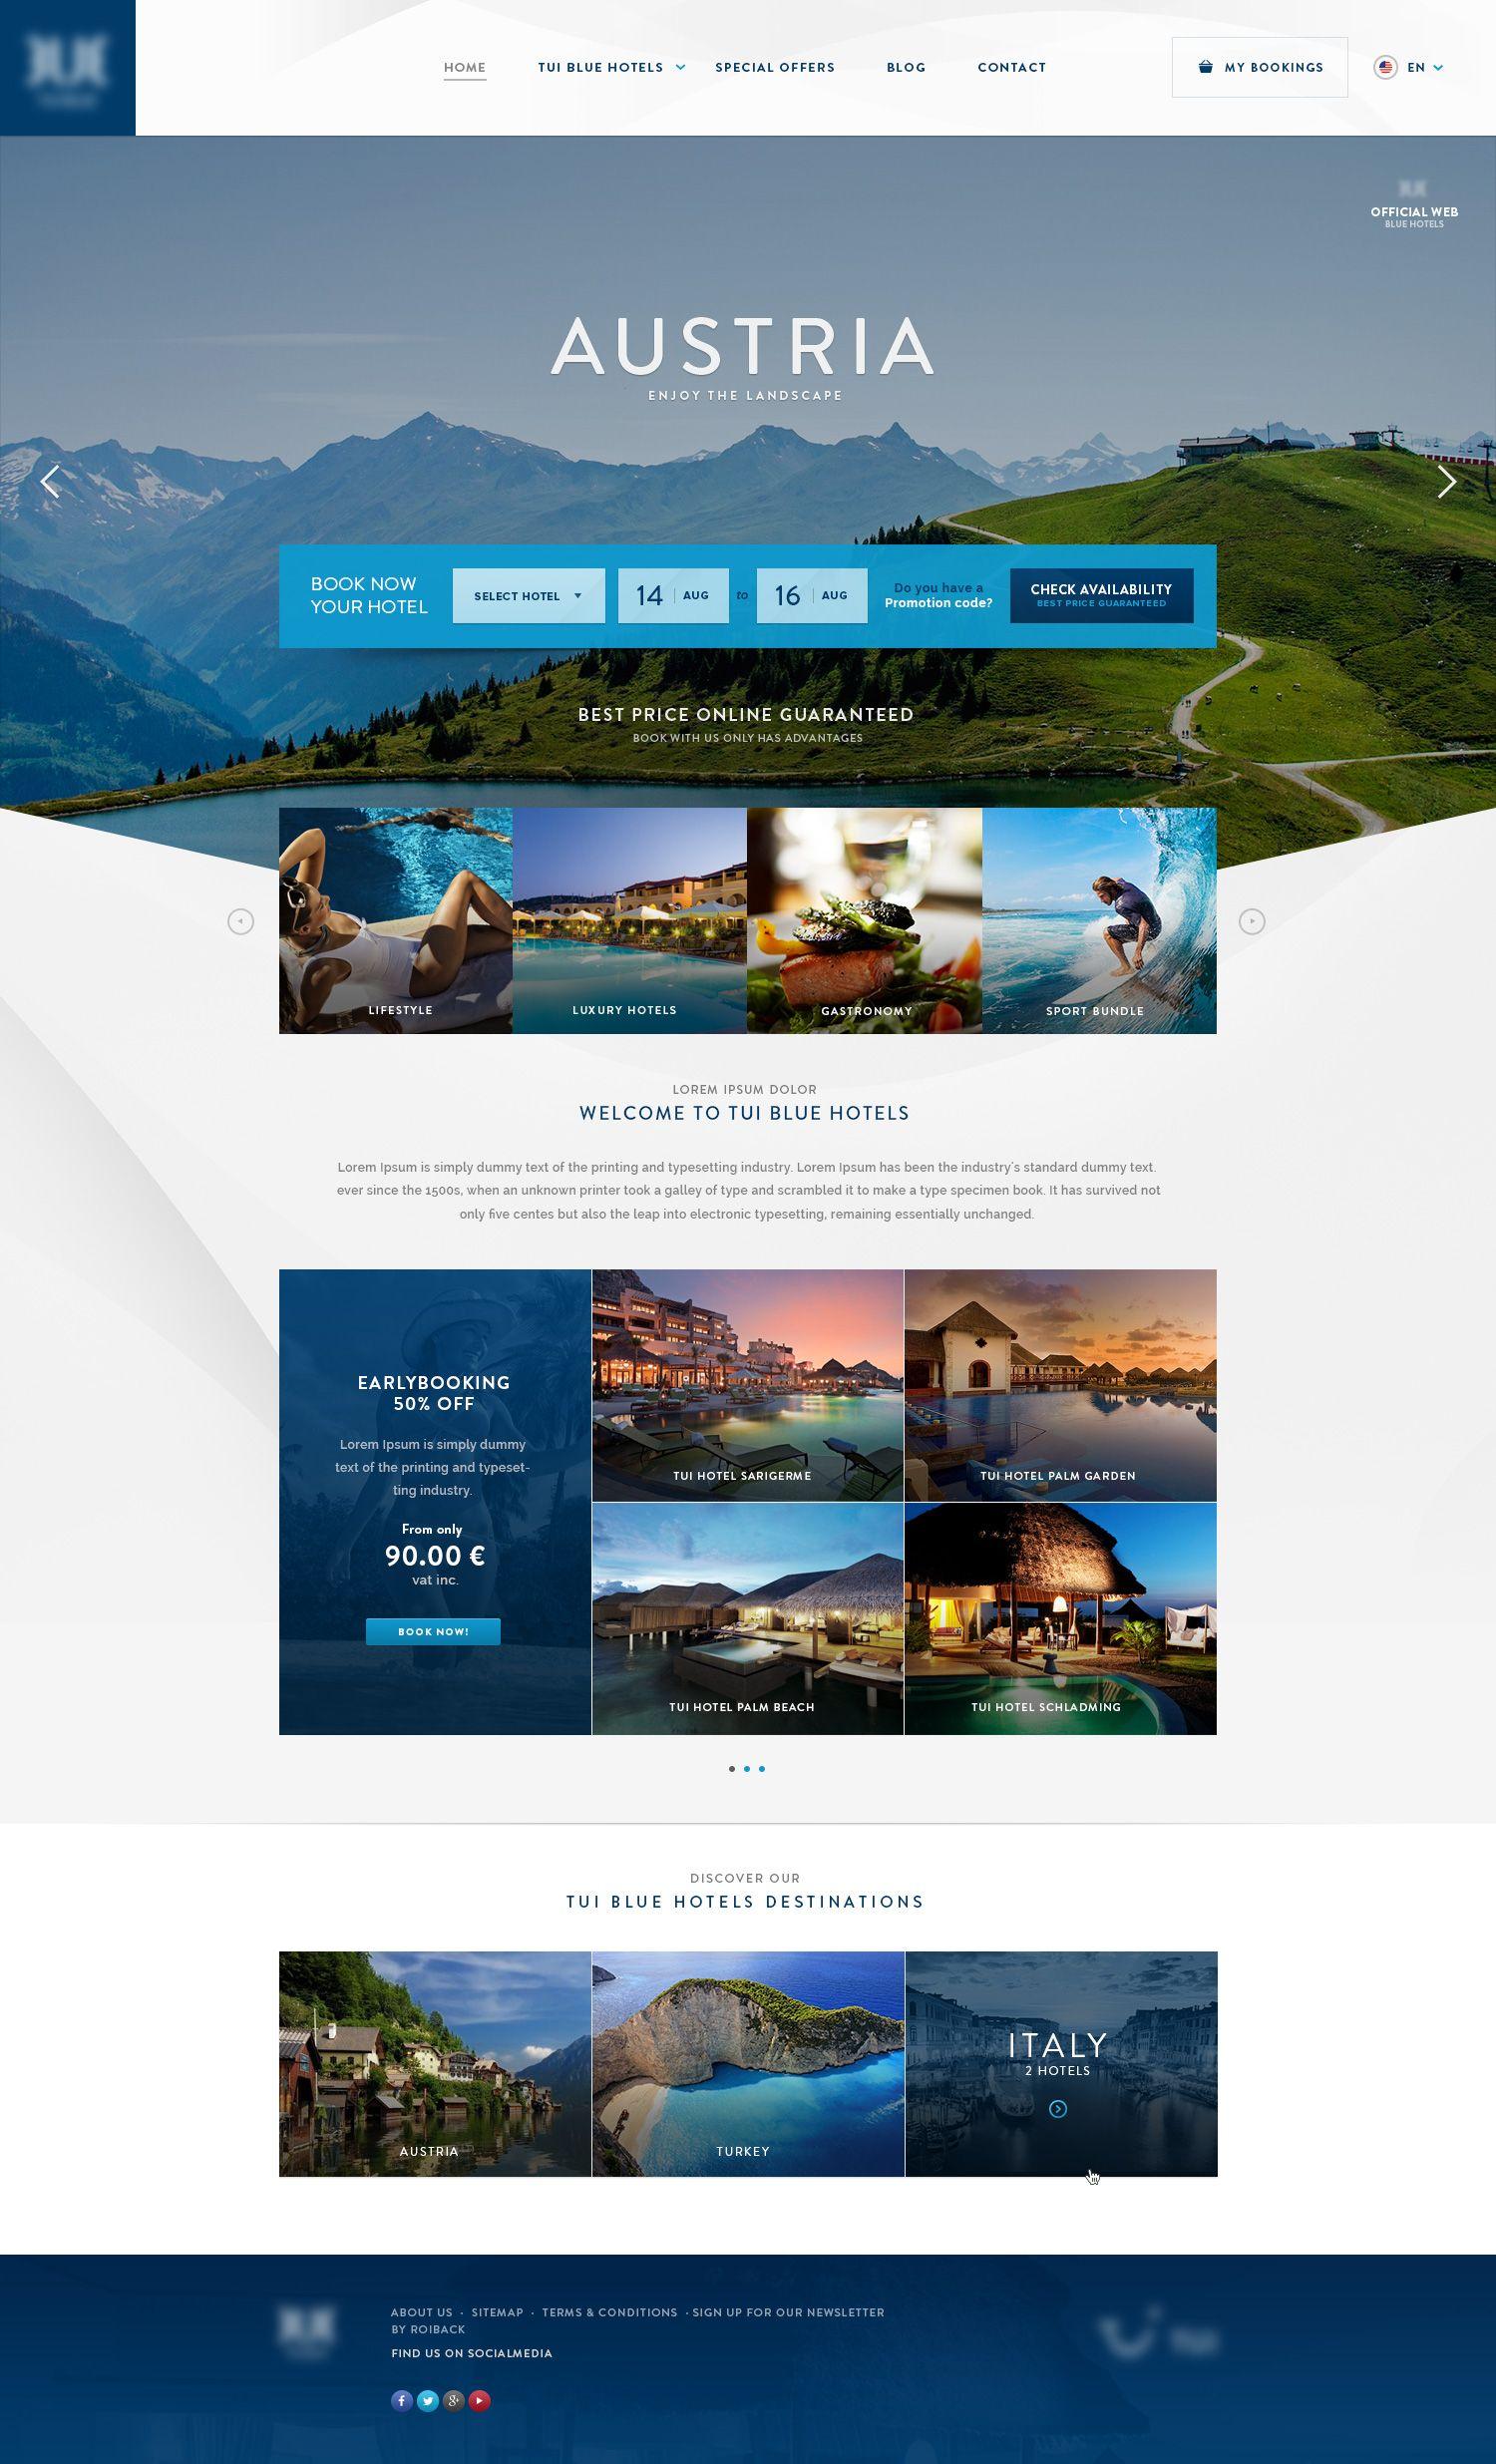 Home Tuiblue Corp Jpg By Xavipuig Hotel Website Design Travel Website Design Web Design